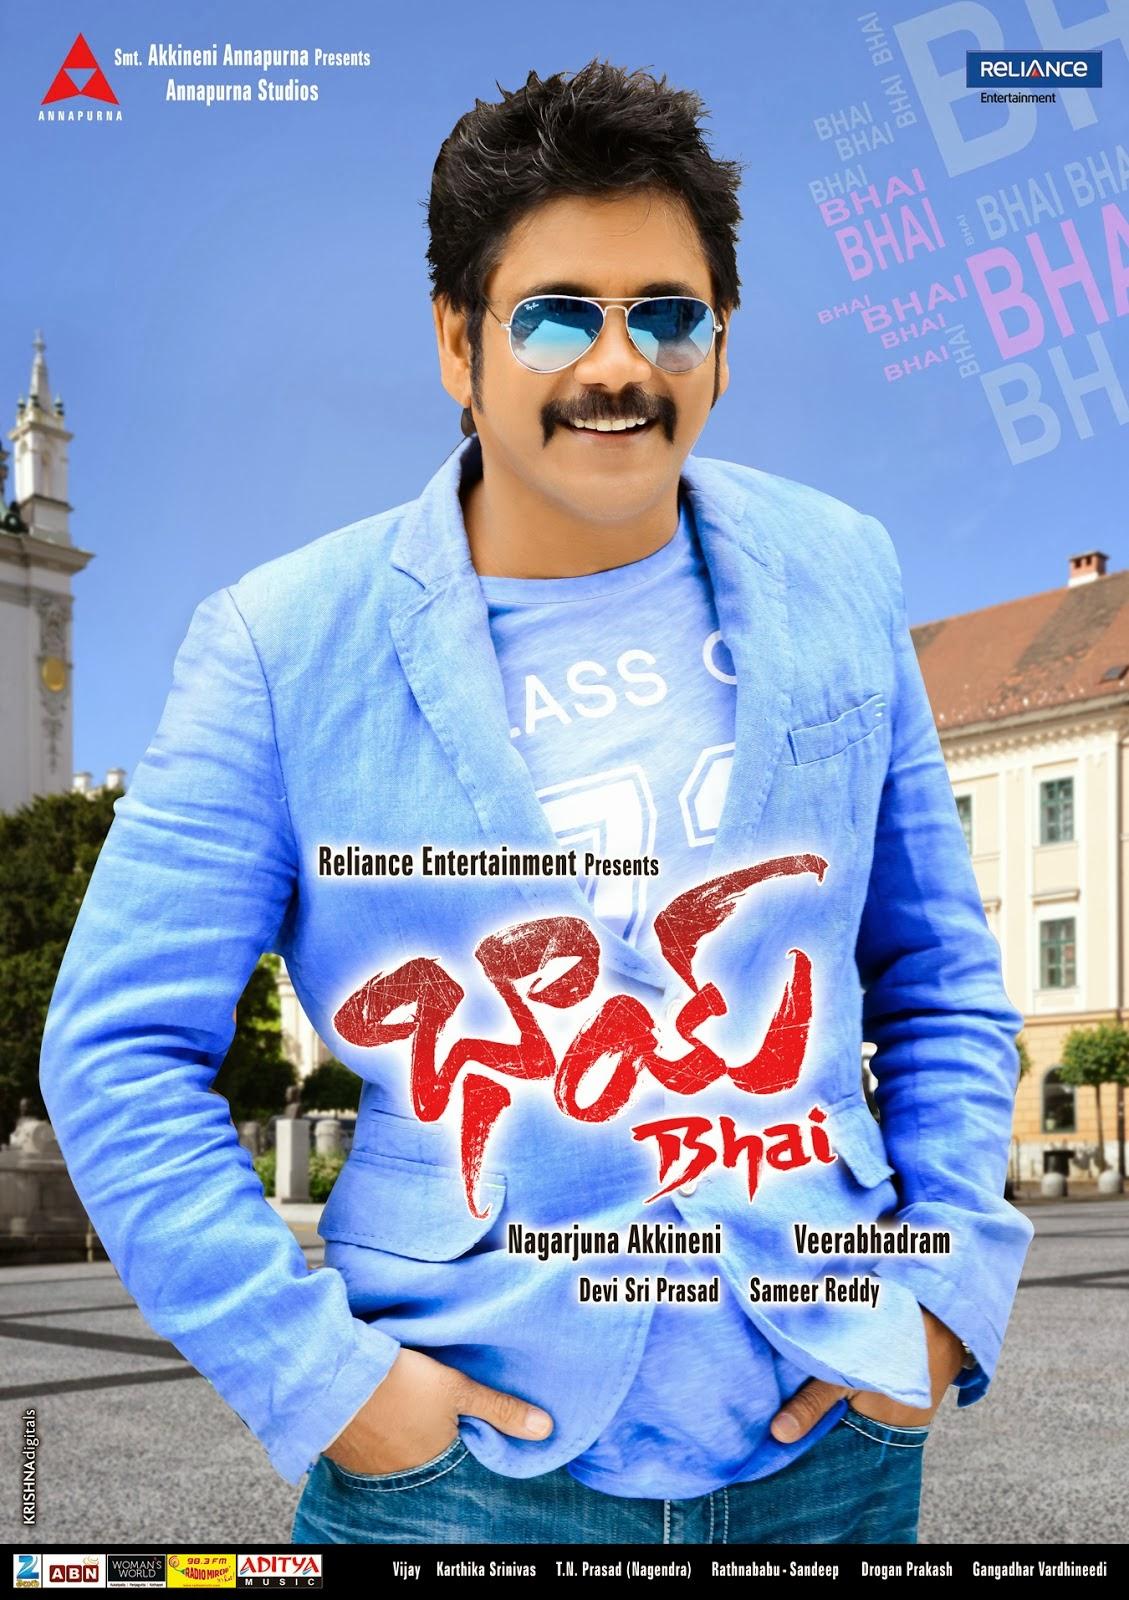 Bhai Movie Latest HQ Movie Posters - AtozCineGallery